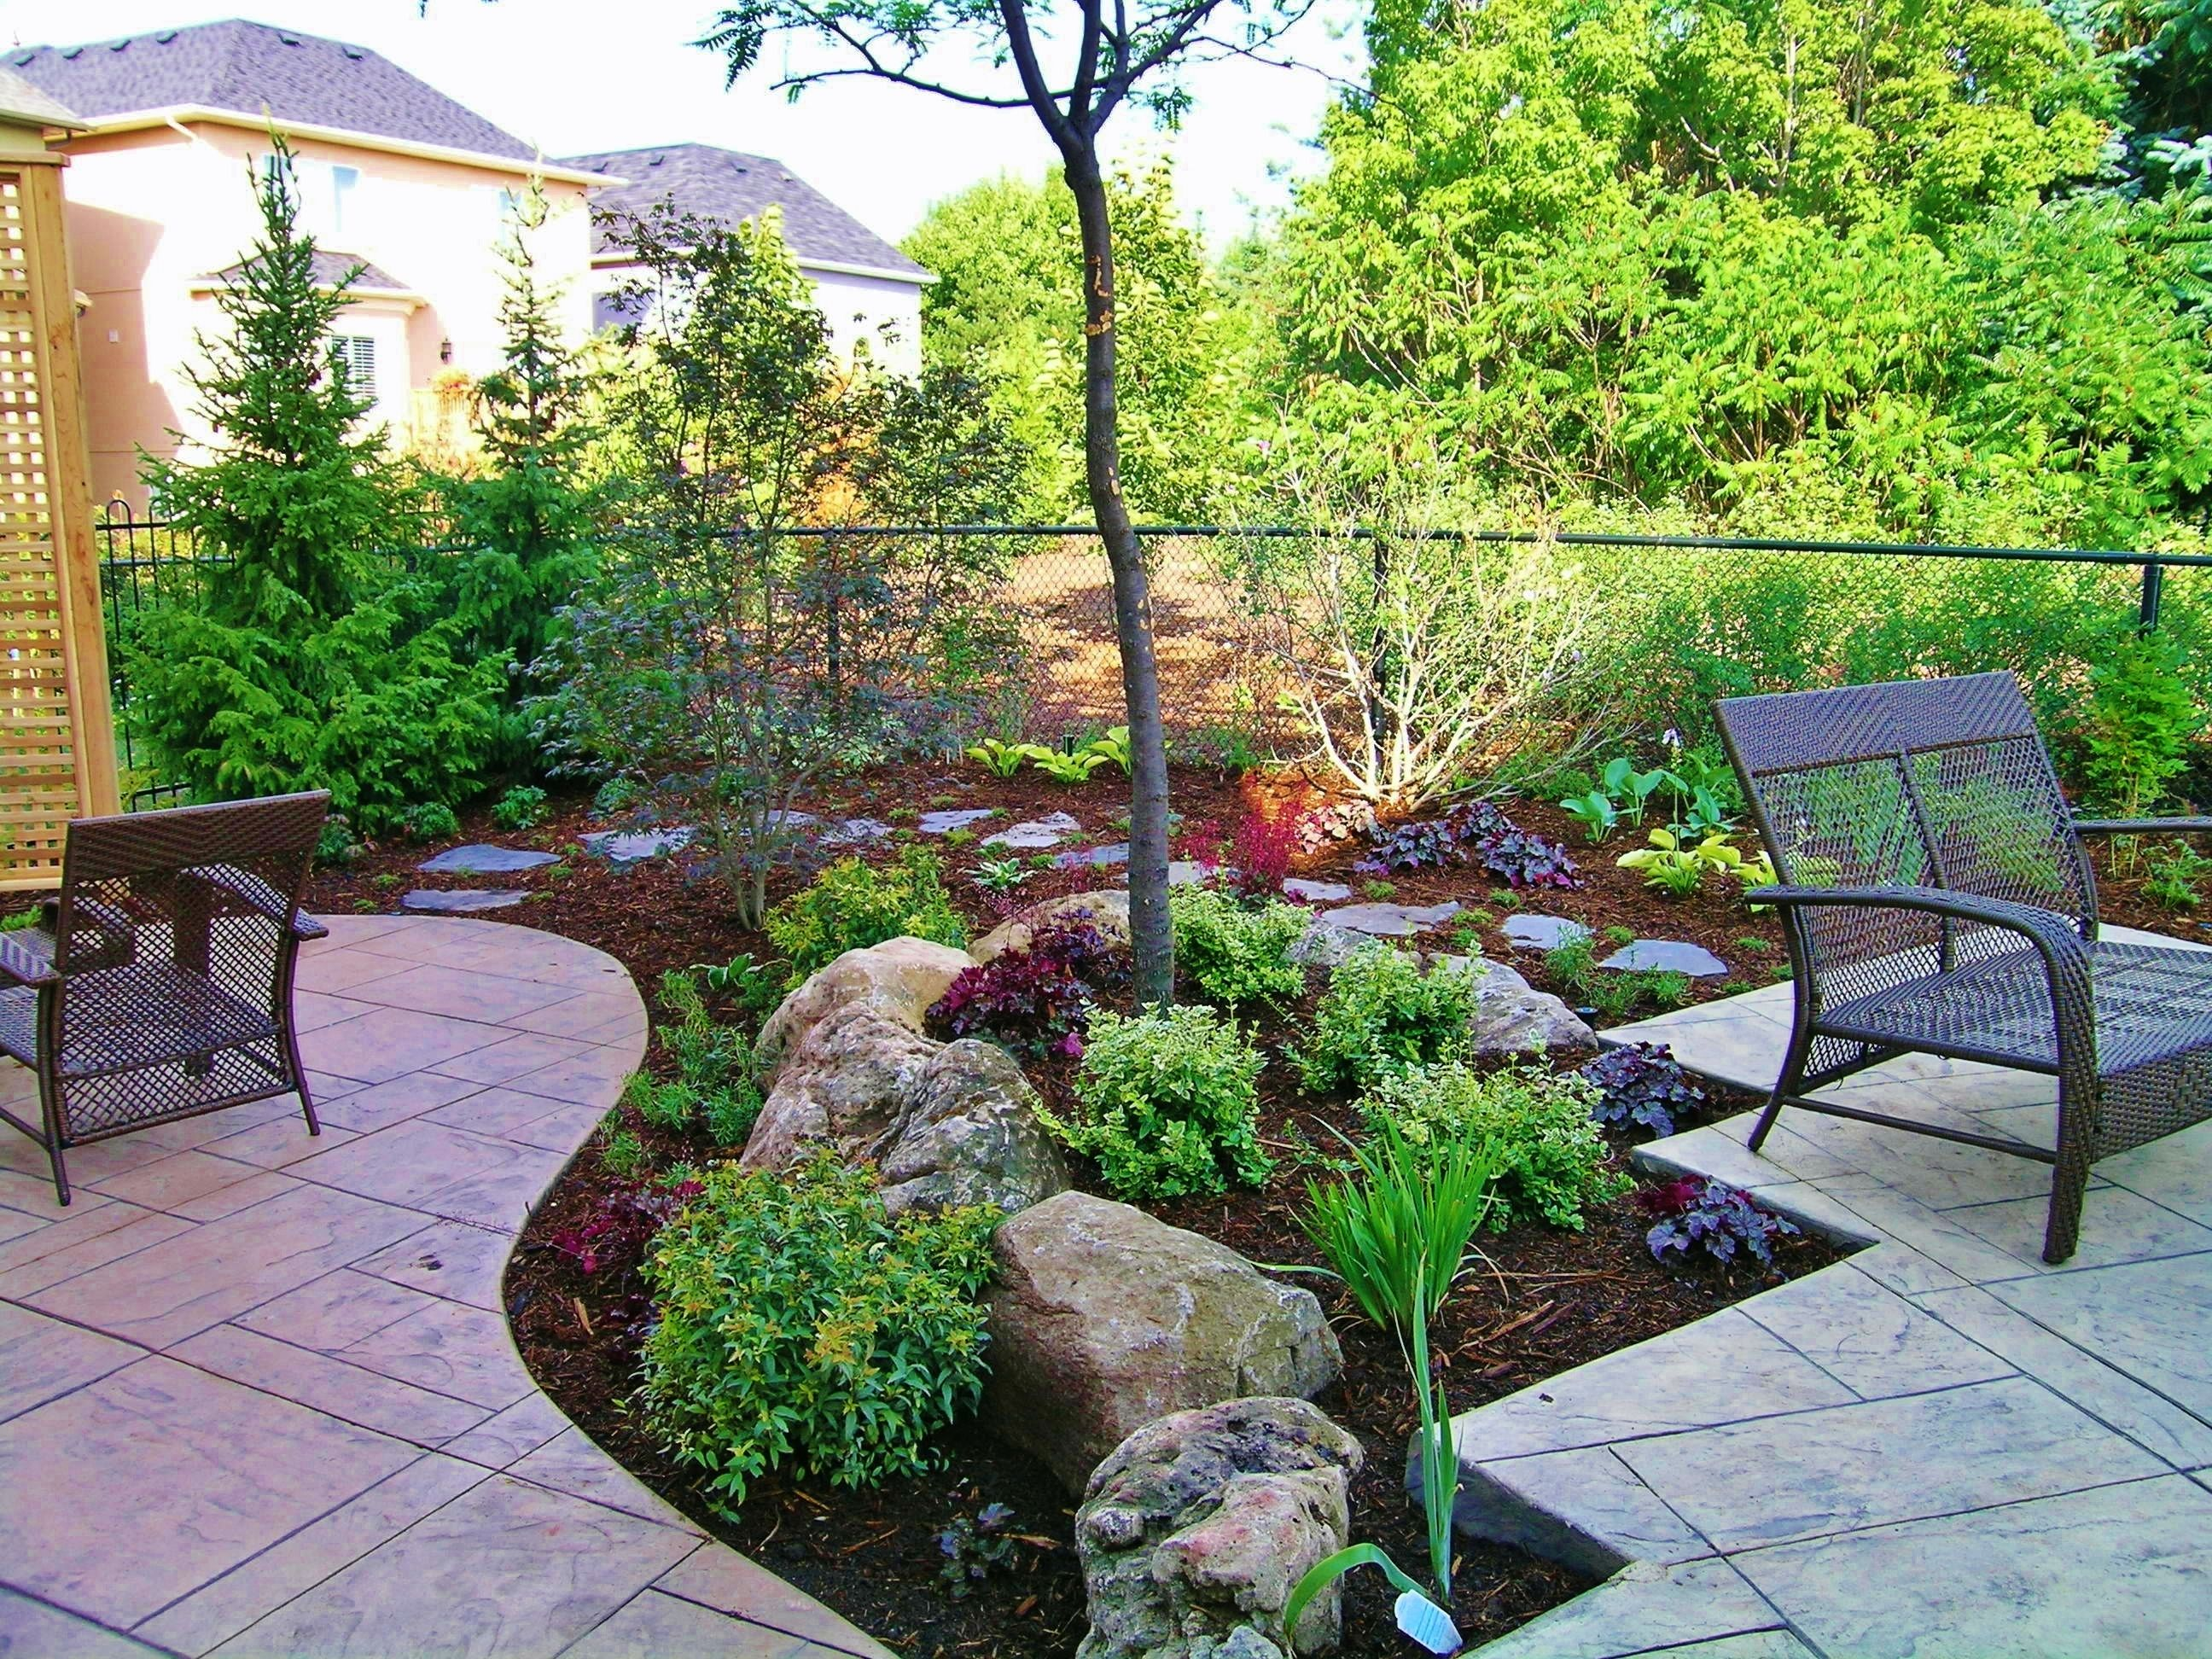 backyard without grass small backyard gardens small on layouts and landscaping small backyards ideas id=39557